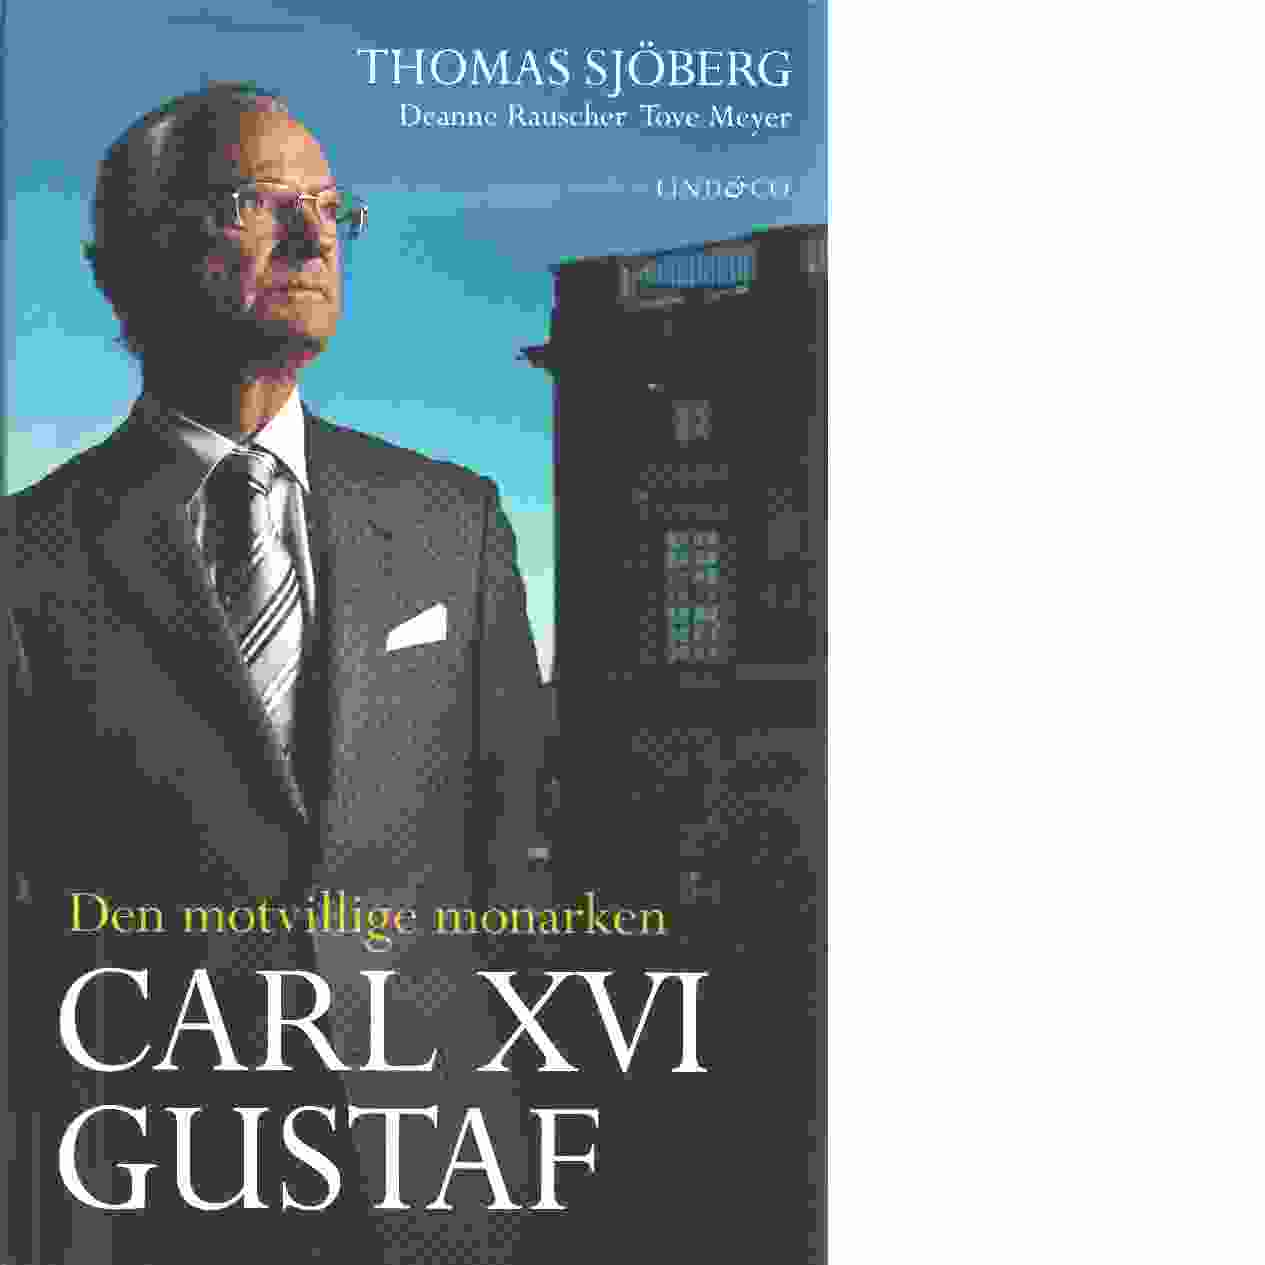 Carl XVI Gustaf - den motvillige monarken - Sjöberg, Thomas och Rauscher, Deanne samt Meyer, Tove